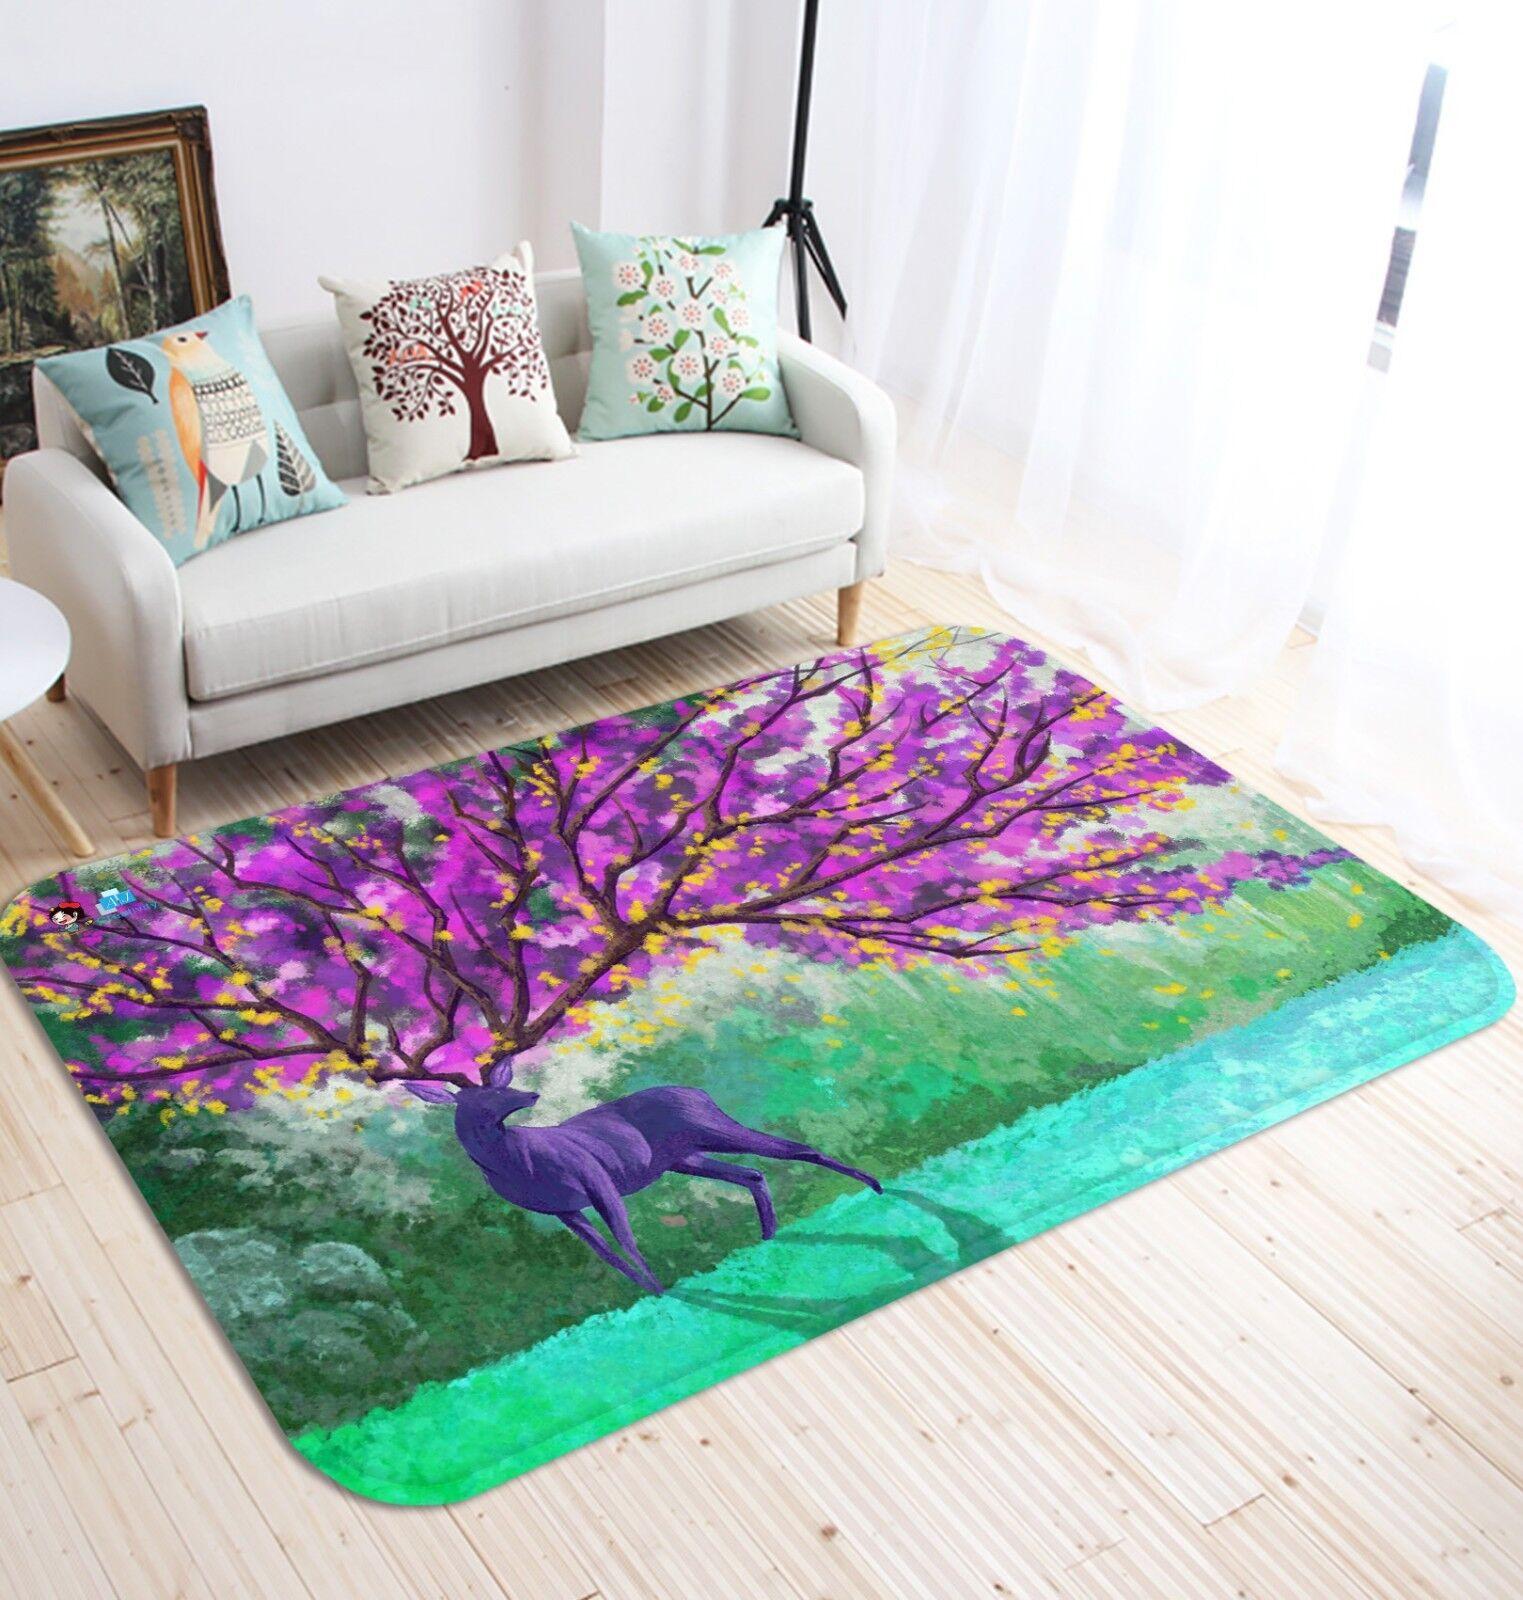 3D Vernice Cervo 3 tappetino antiscivolo tappeto camera Tappetino Qualità Elegante foto Tappeto UK Estate